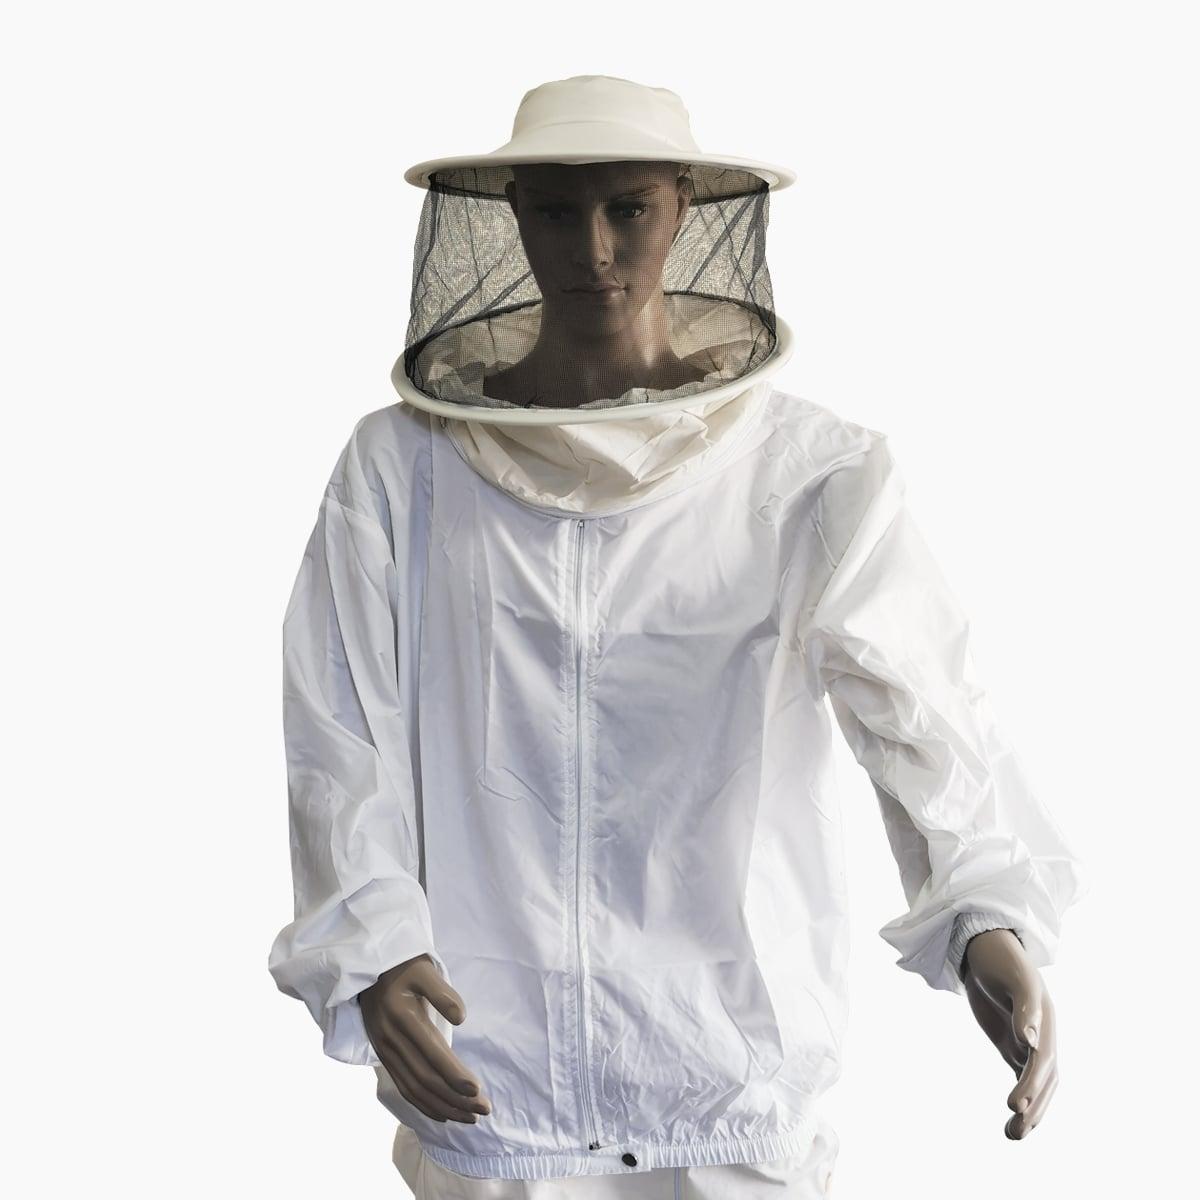 Blusón apicultor doble Nylon